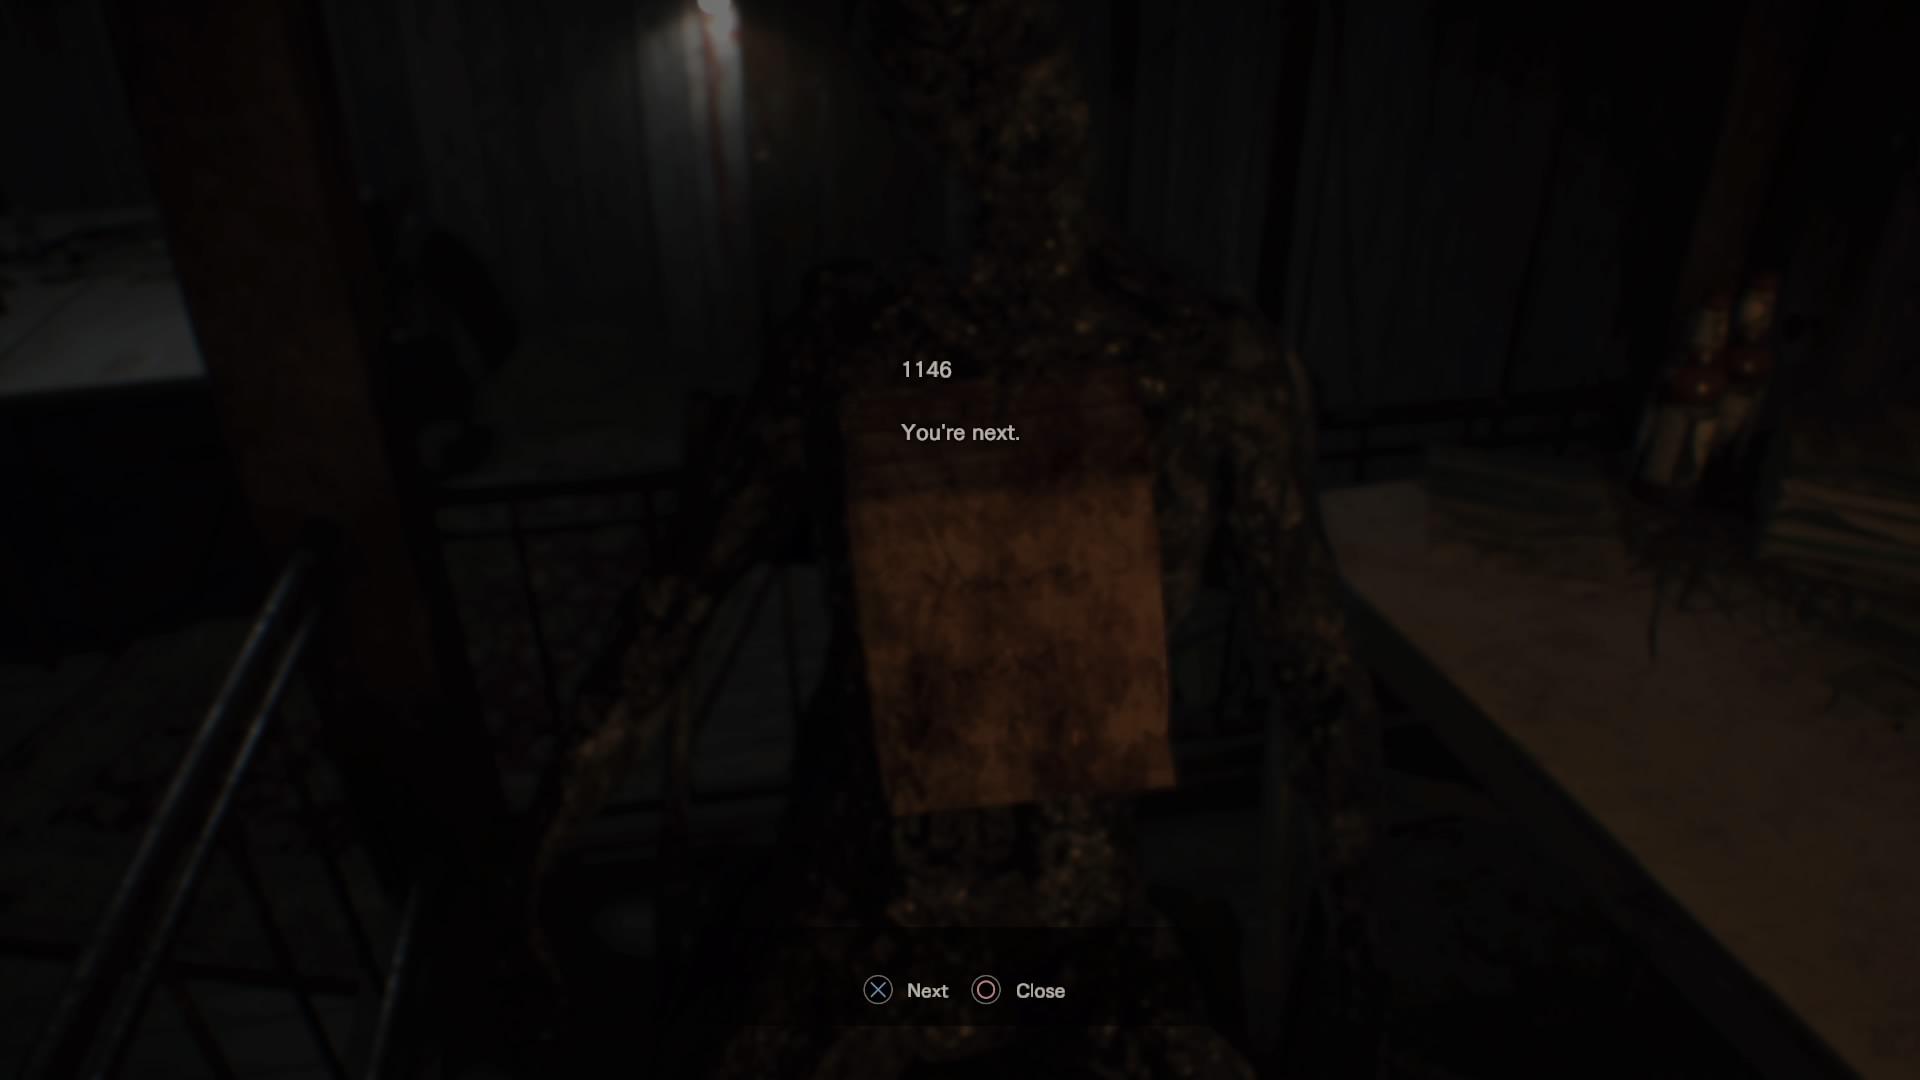 Memo on Burnt Corpse